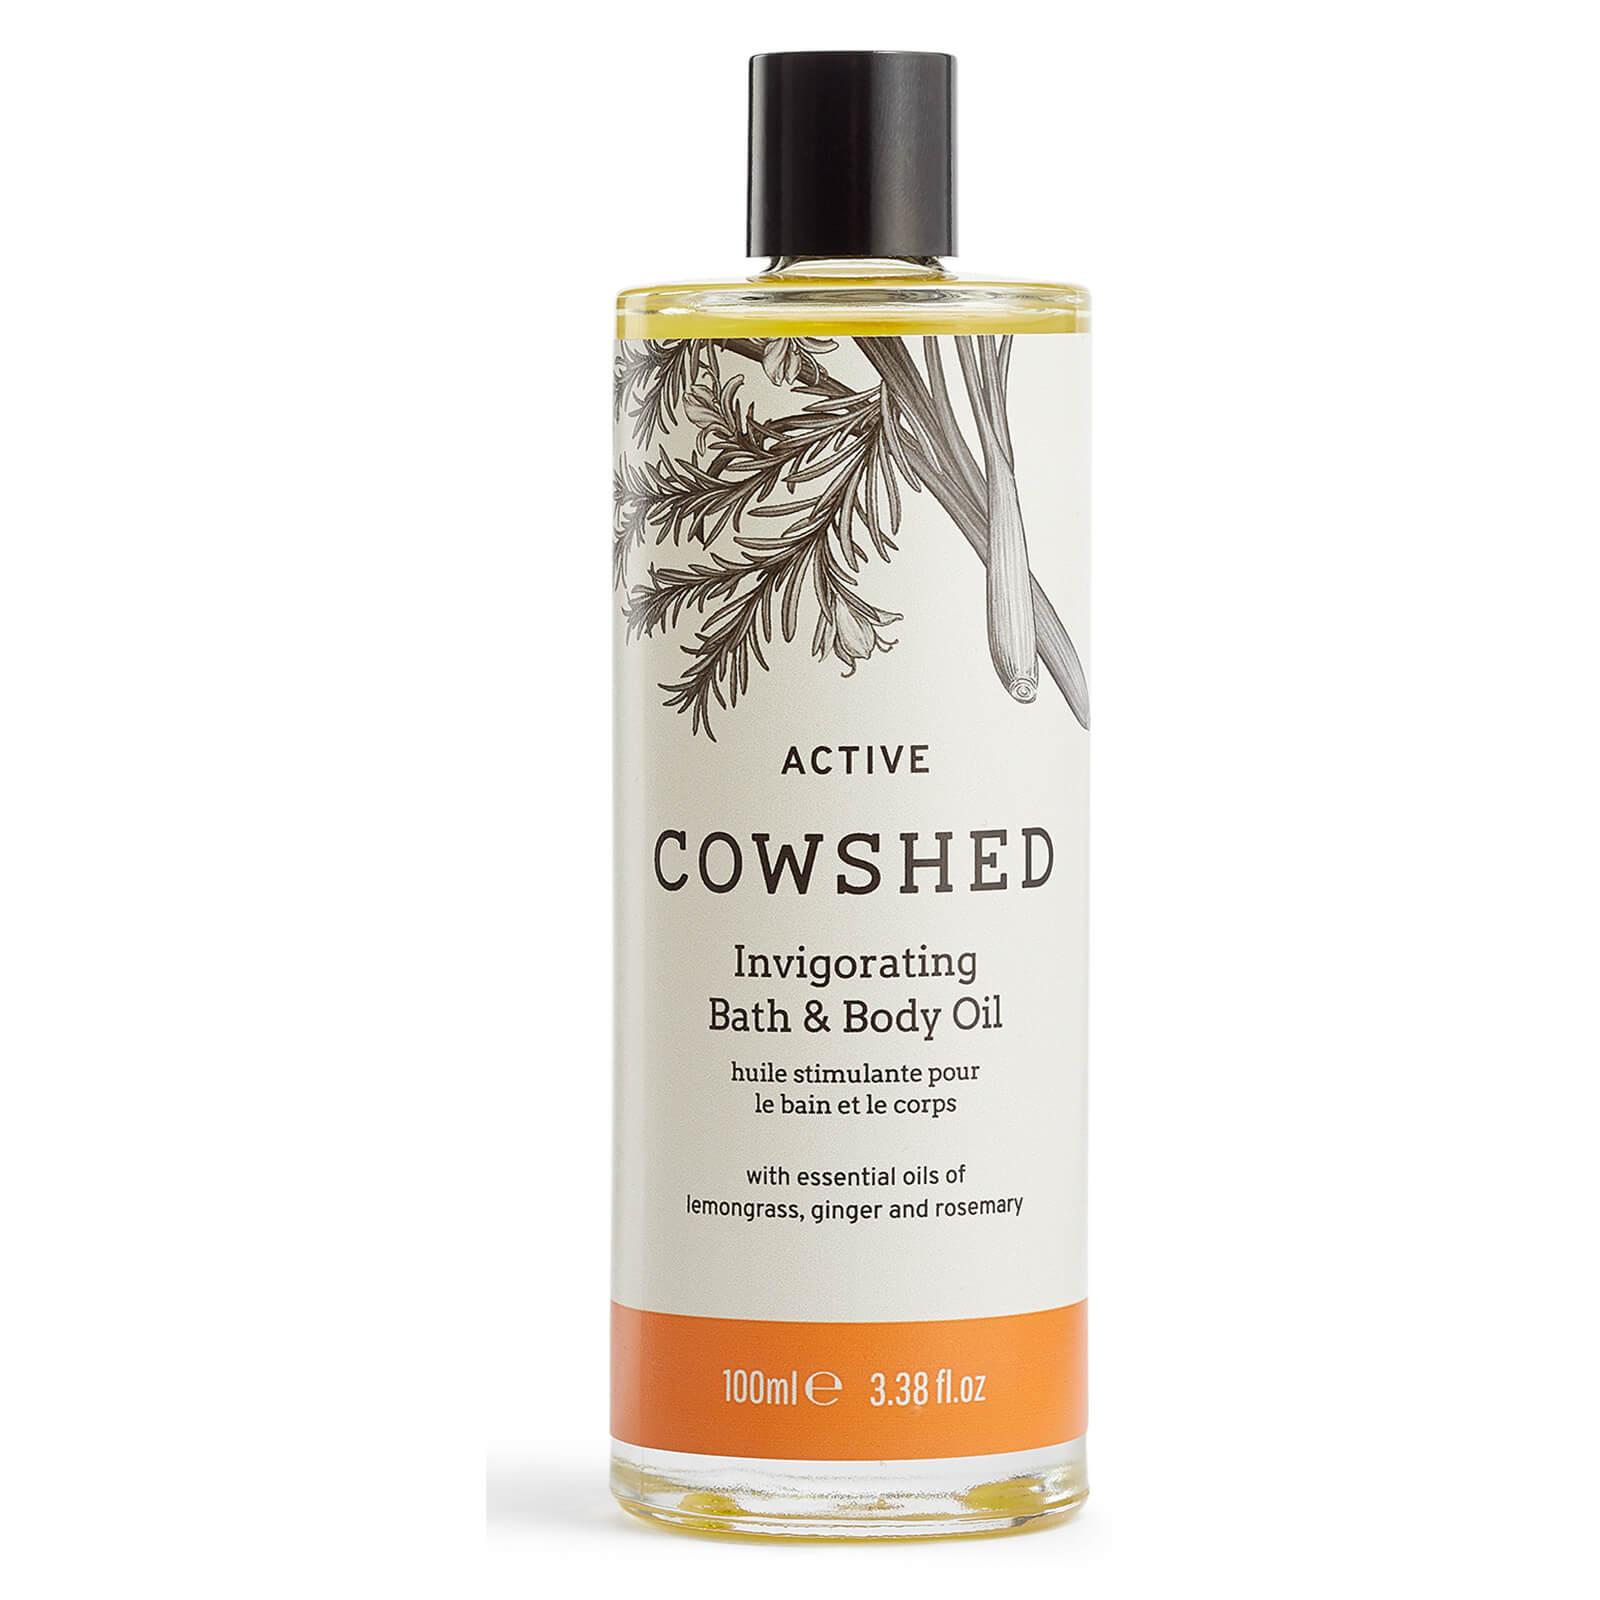 Купить Cowshed ACTIVE Invigorating Bath & Body Oil 100ml